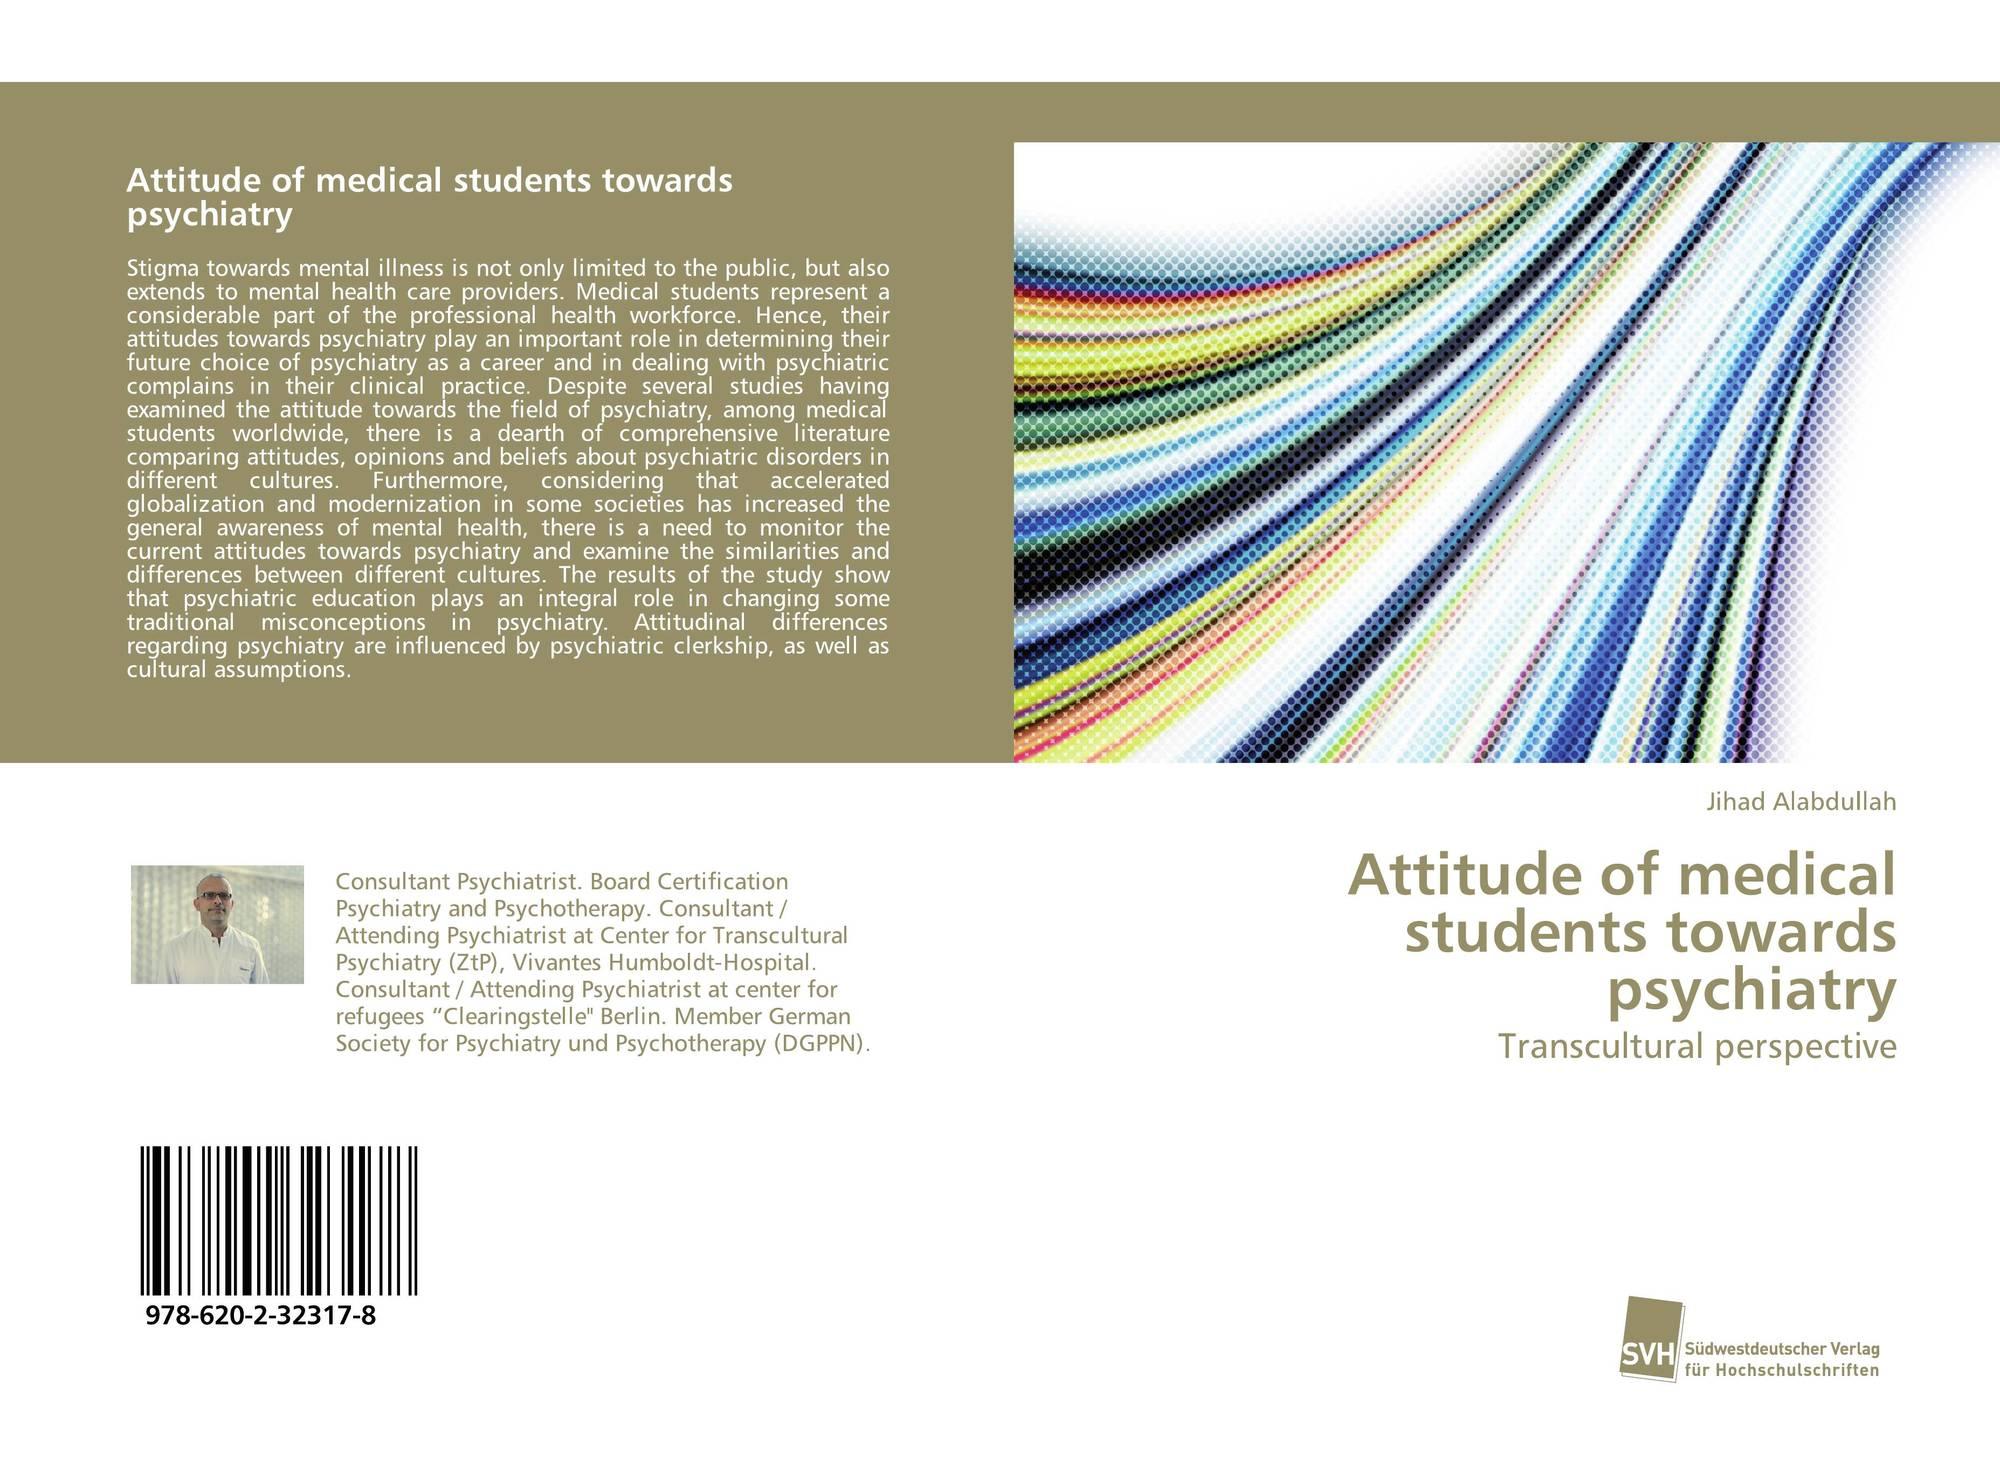 Attitude of medical students towards psychiatry, 978-620-2